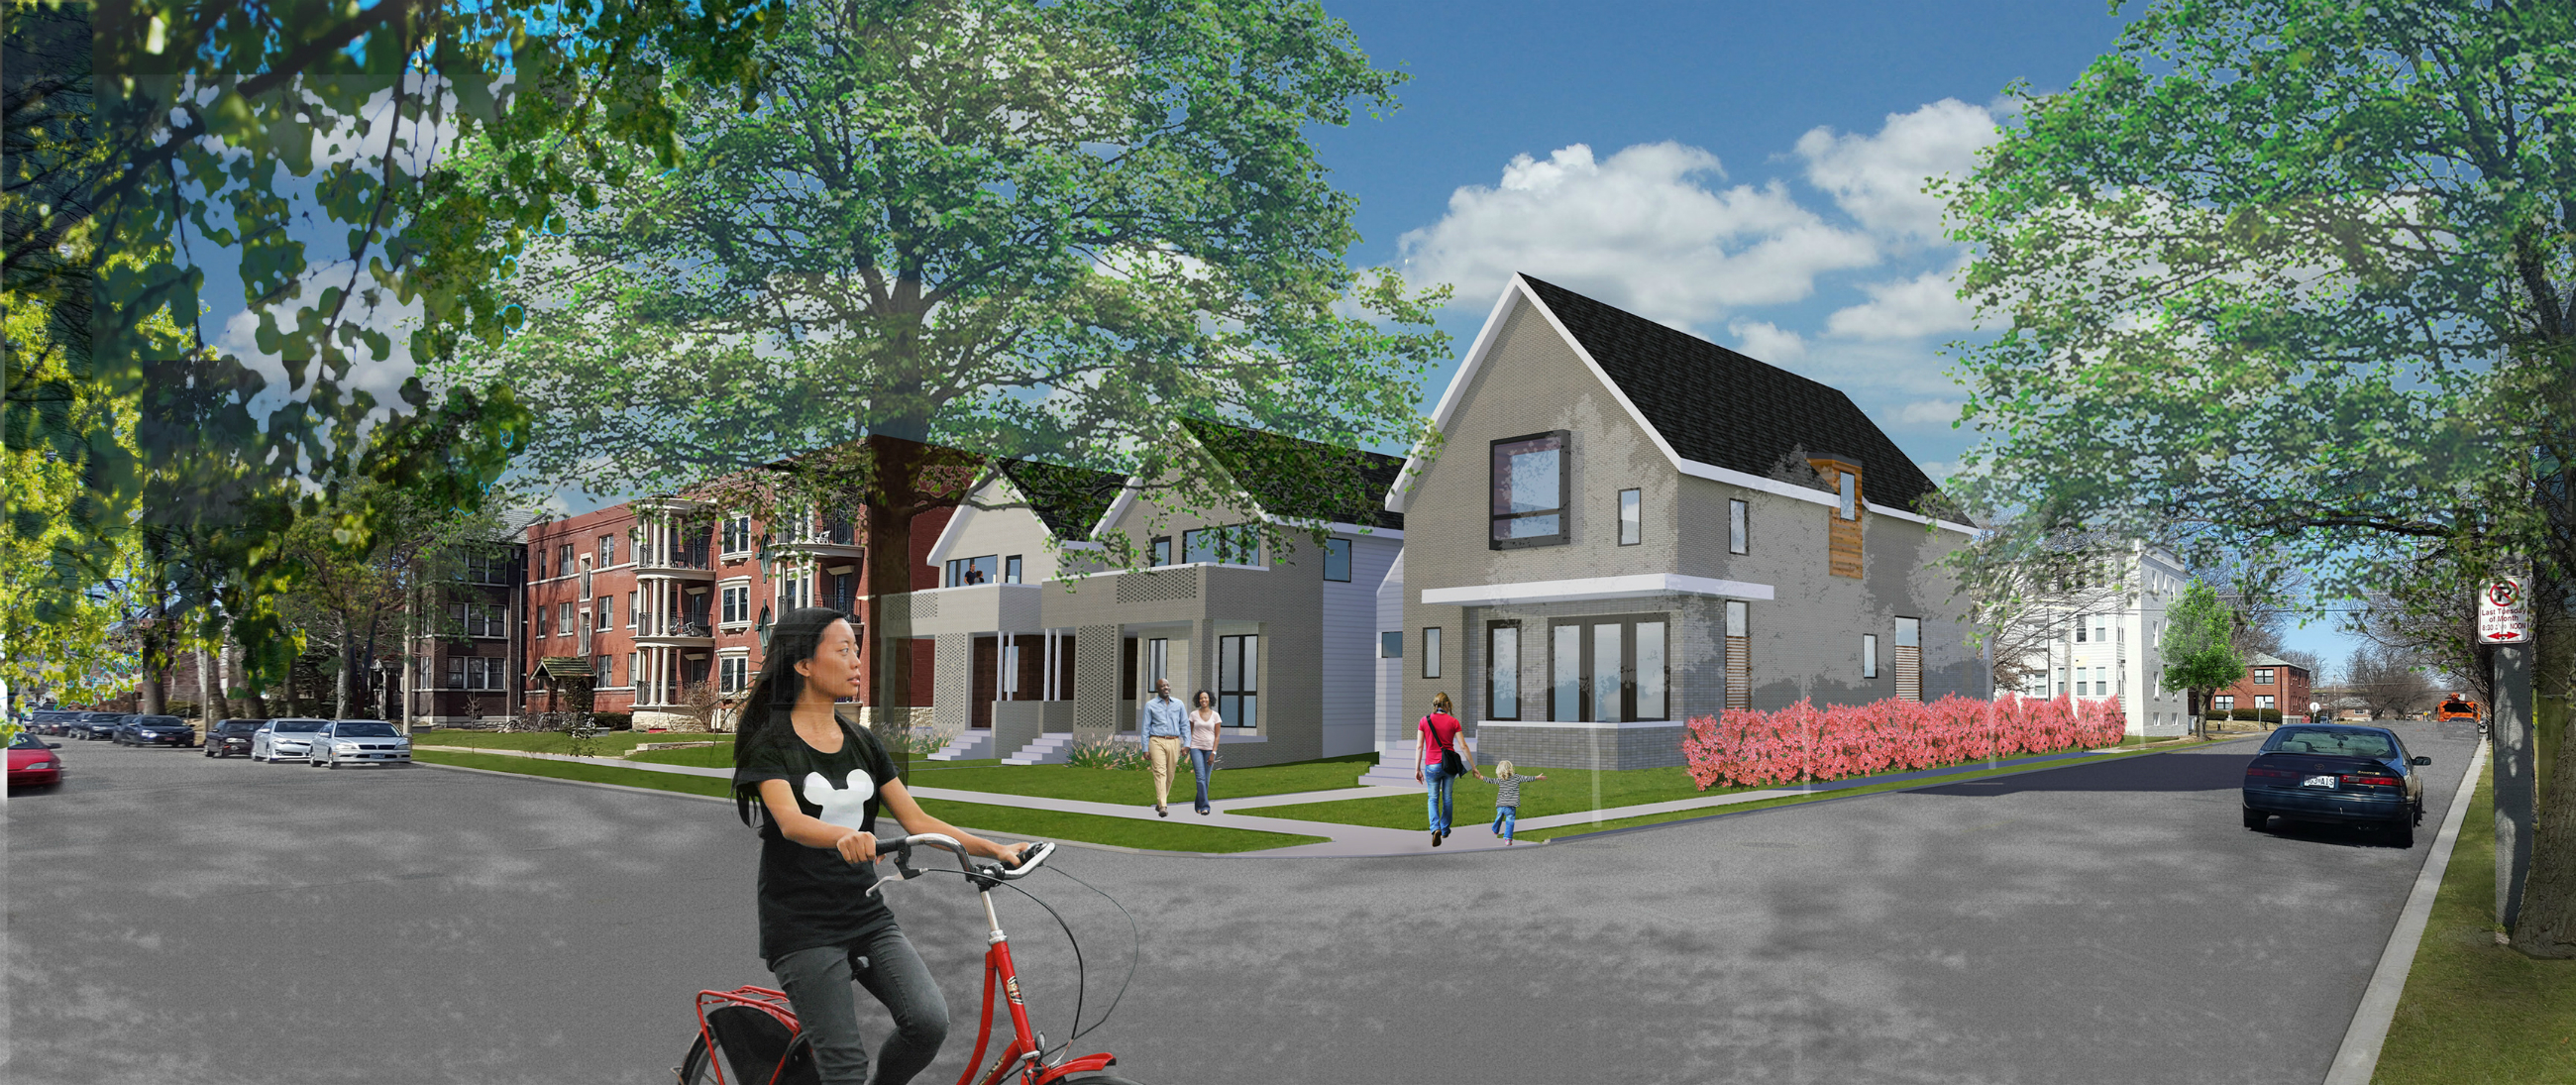 UIC Proposes Three Infill Homes in City's Skinker-DeBaliviere Neighborhood